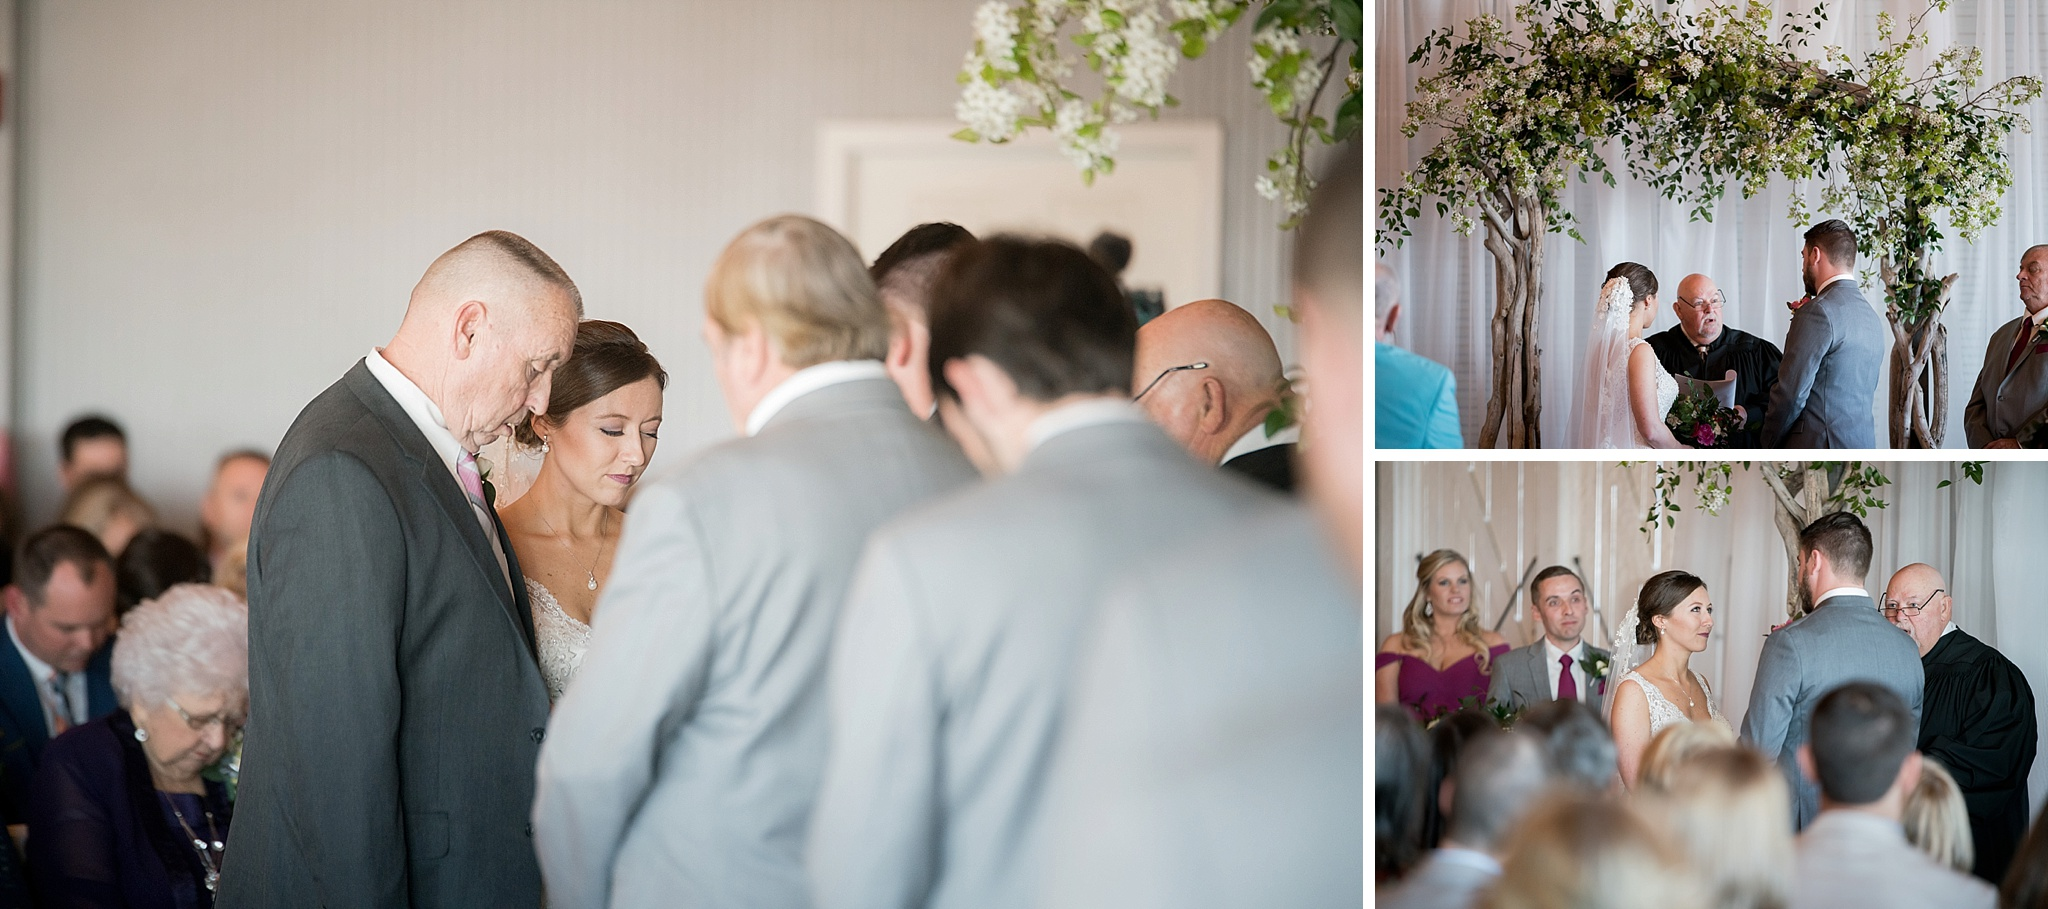 Manteo-NC-Wedding-Photographer-143.jpg